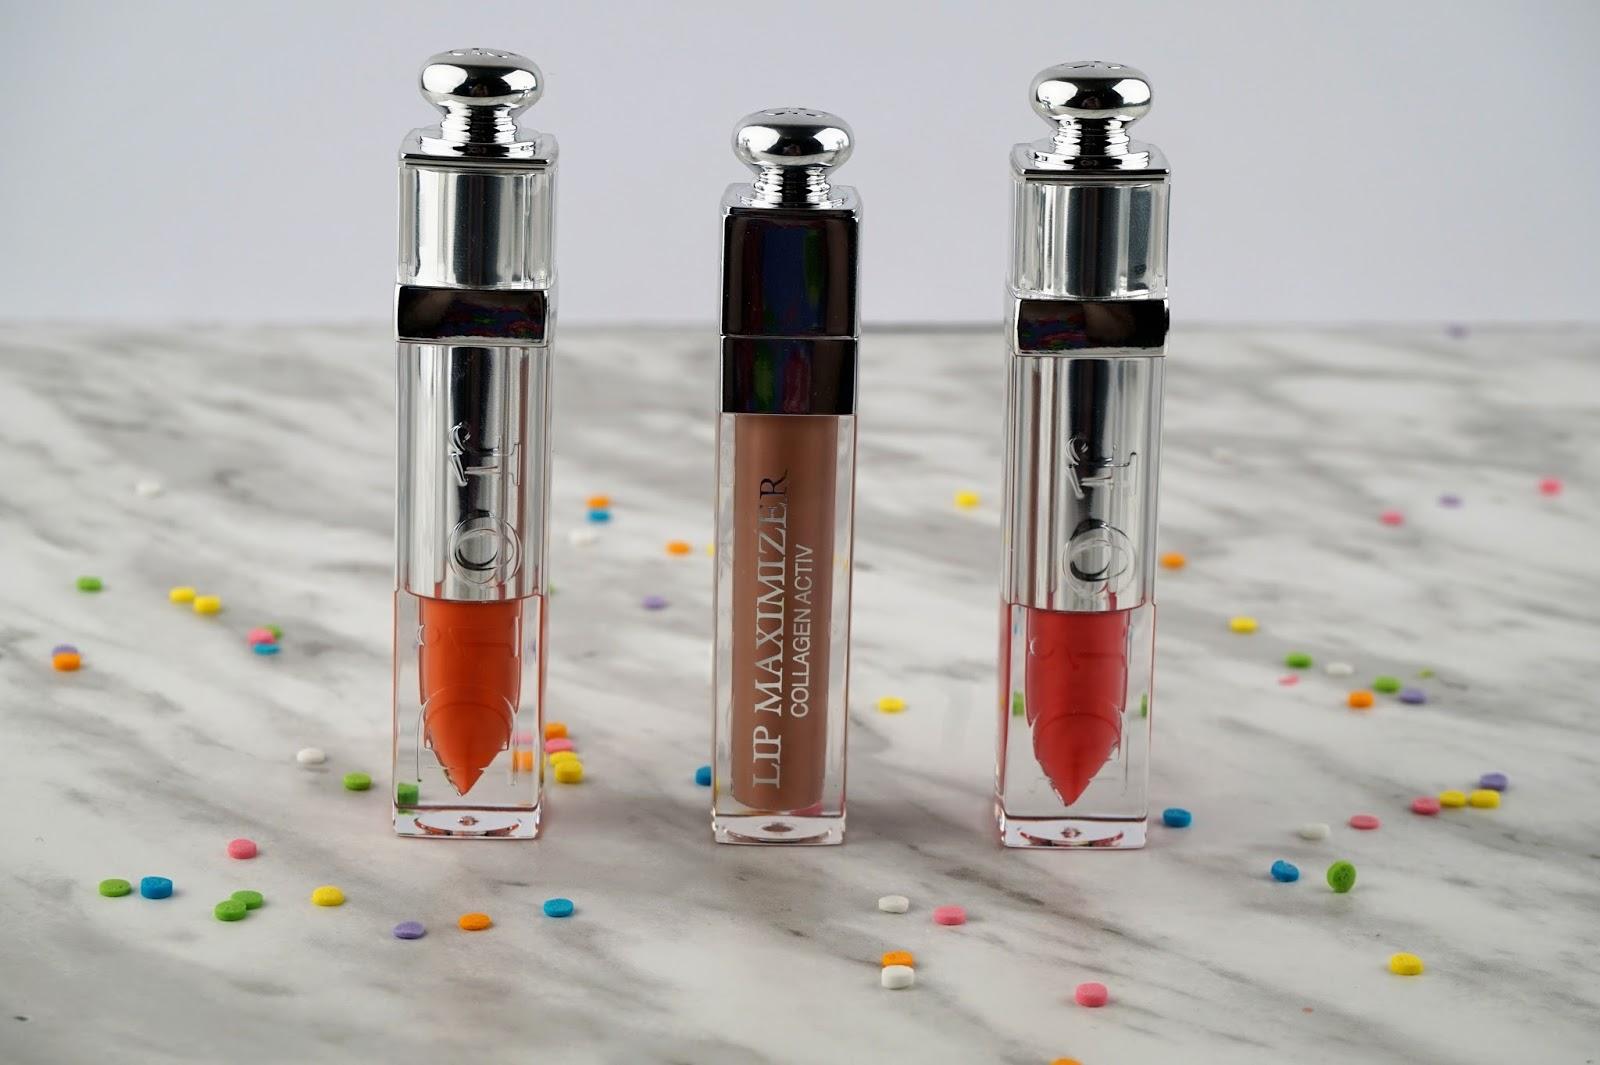 Dior Addict Milky Tint Milky Pop Milky Peach Lip Maximizer Beige Sunrise Review Swatches